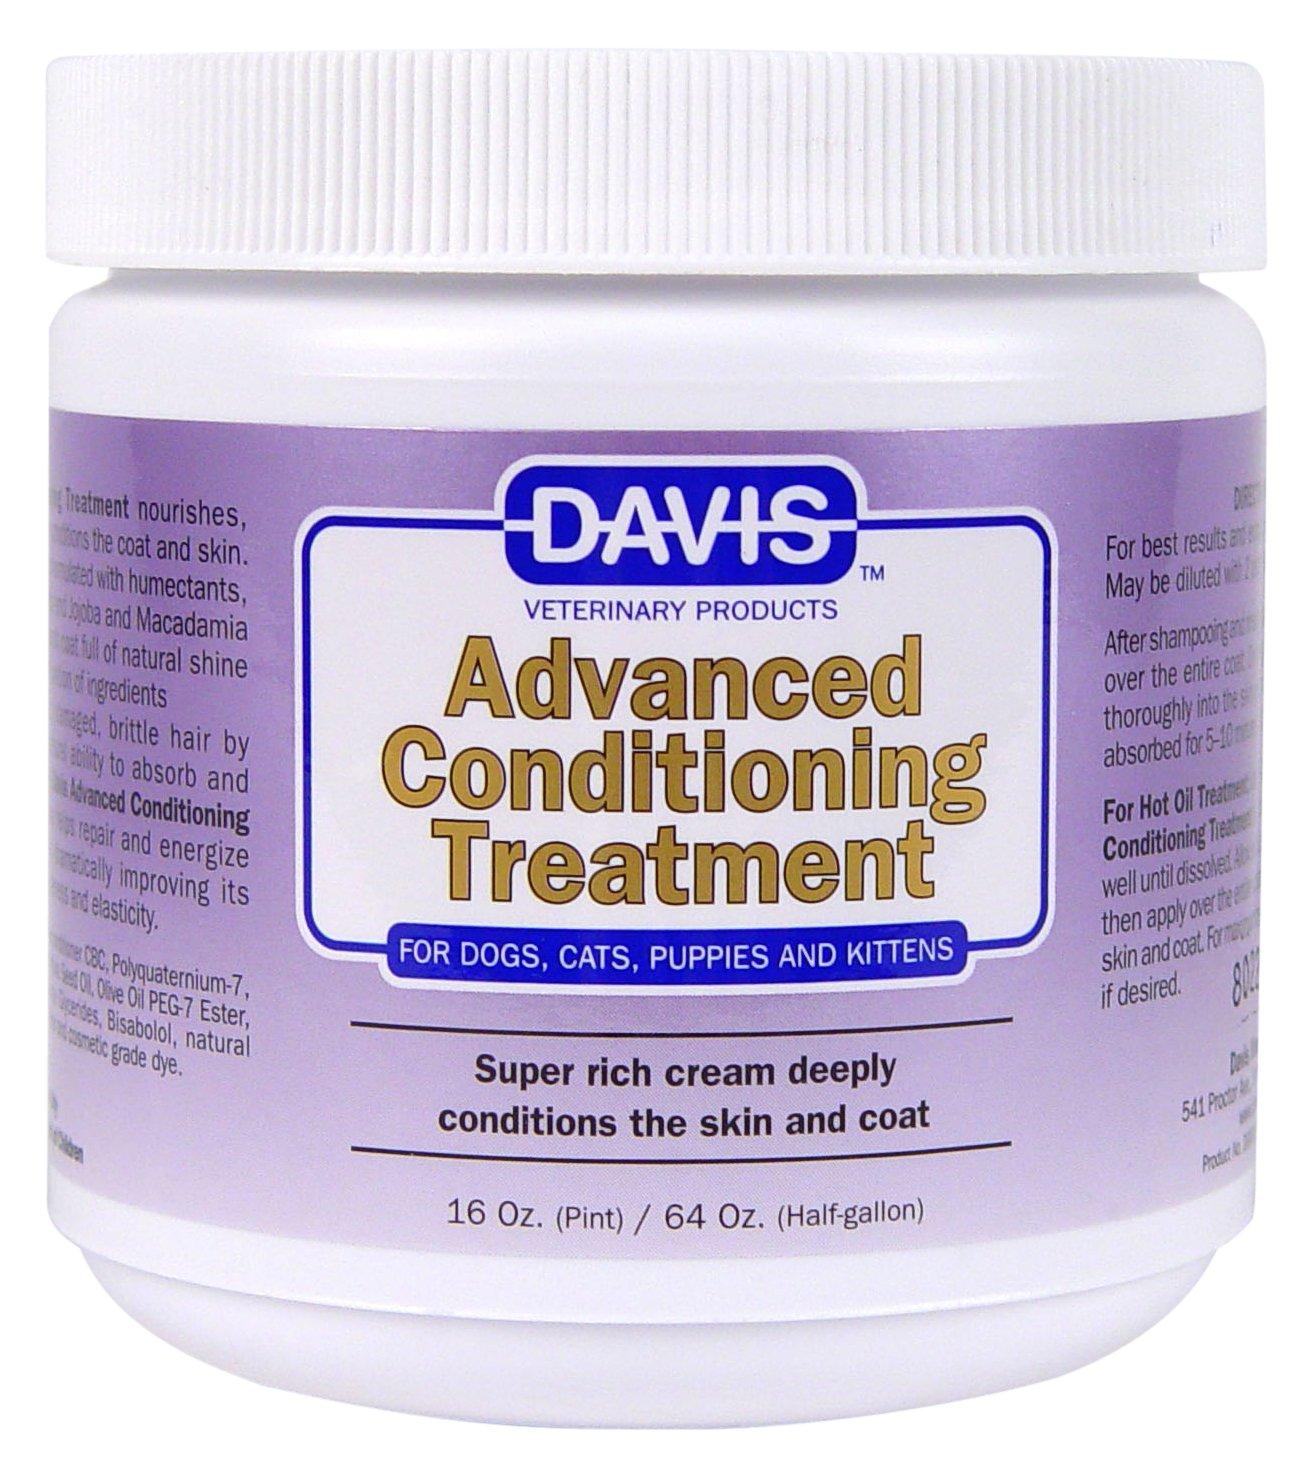 Davis Advanced Conditioning Treatment for Pets, 16 oz